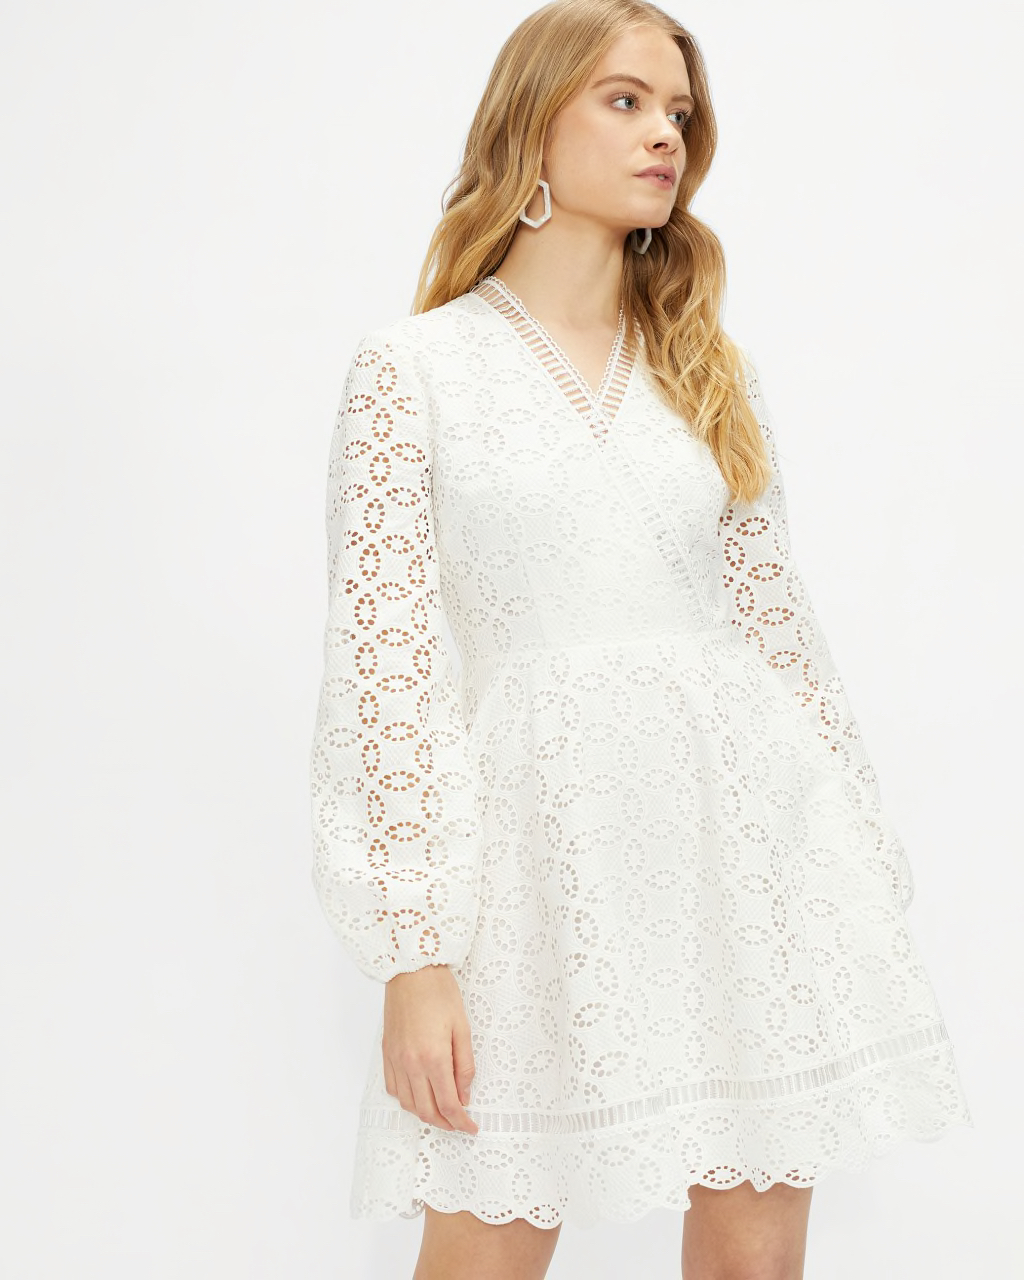 LIYAA Broderie Long Sleeve Mini Dress Ted Baker White